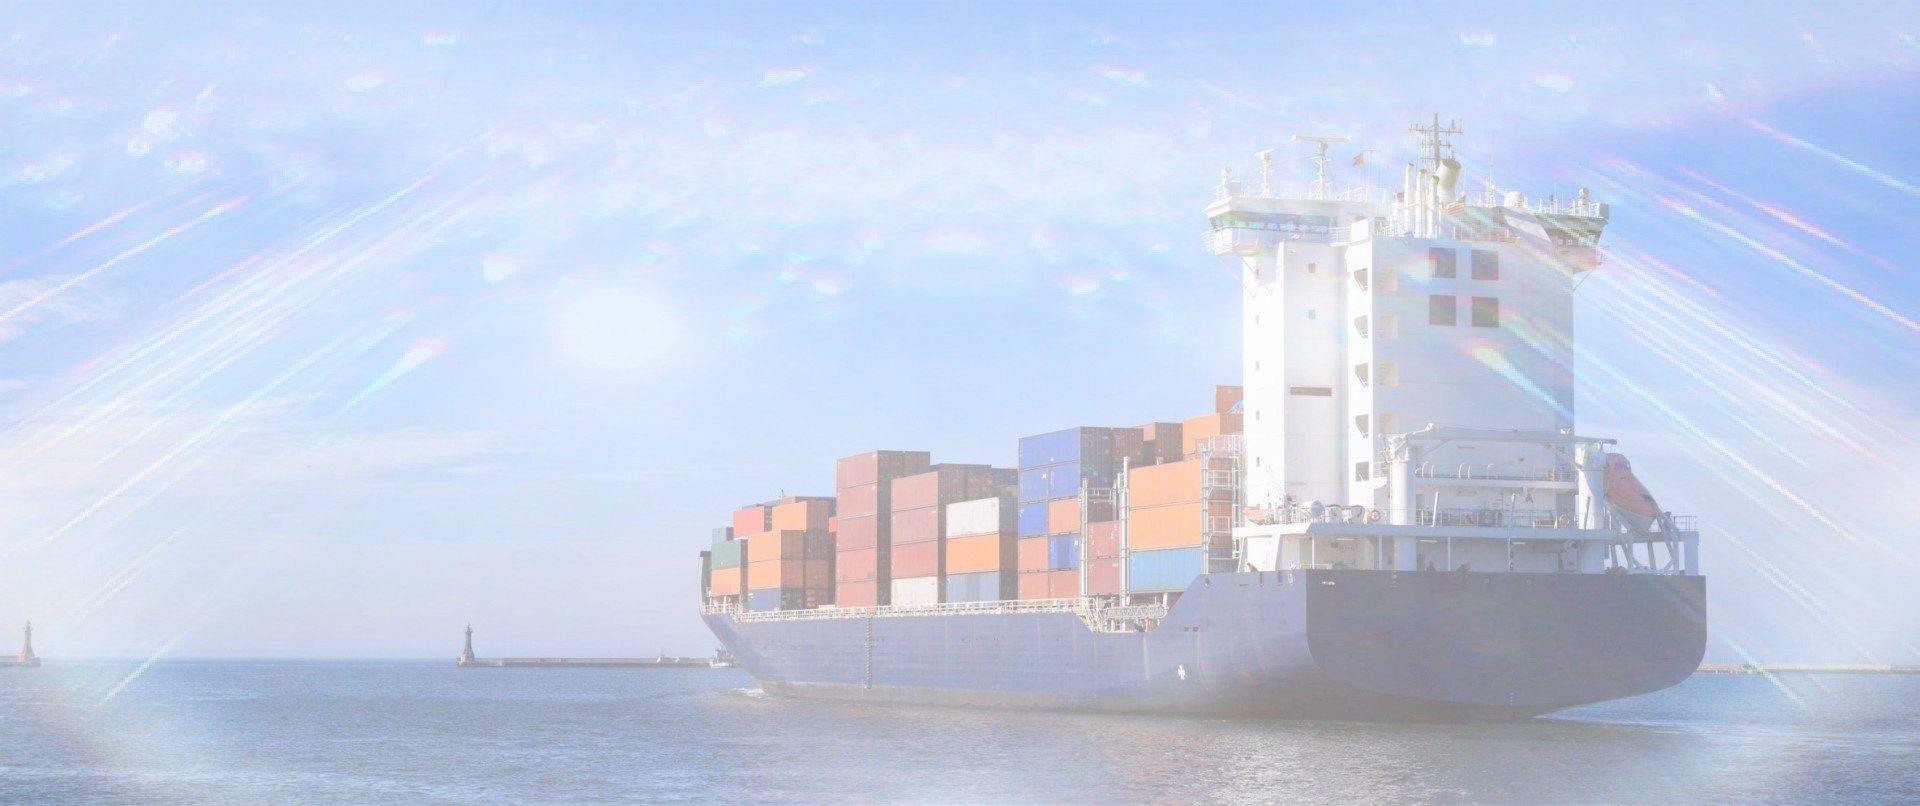 gl ship manager User's manual - gl shipmanager 20 1 compliance management 11 incident management module 111 introduction the incident management module is a main.